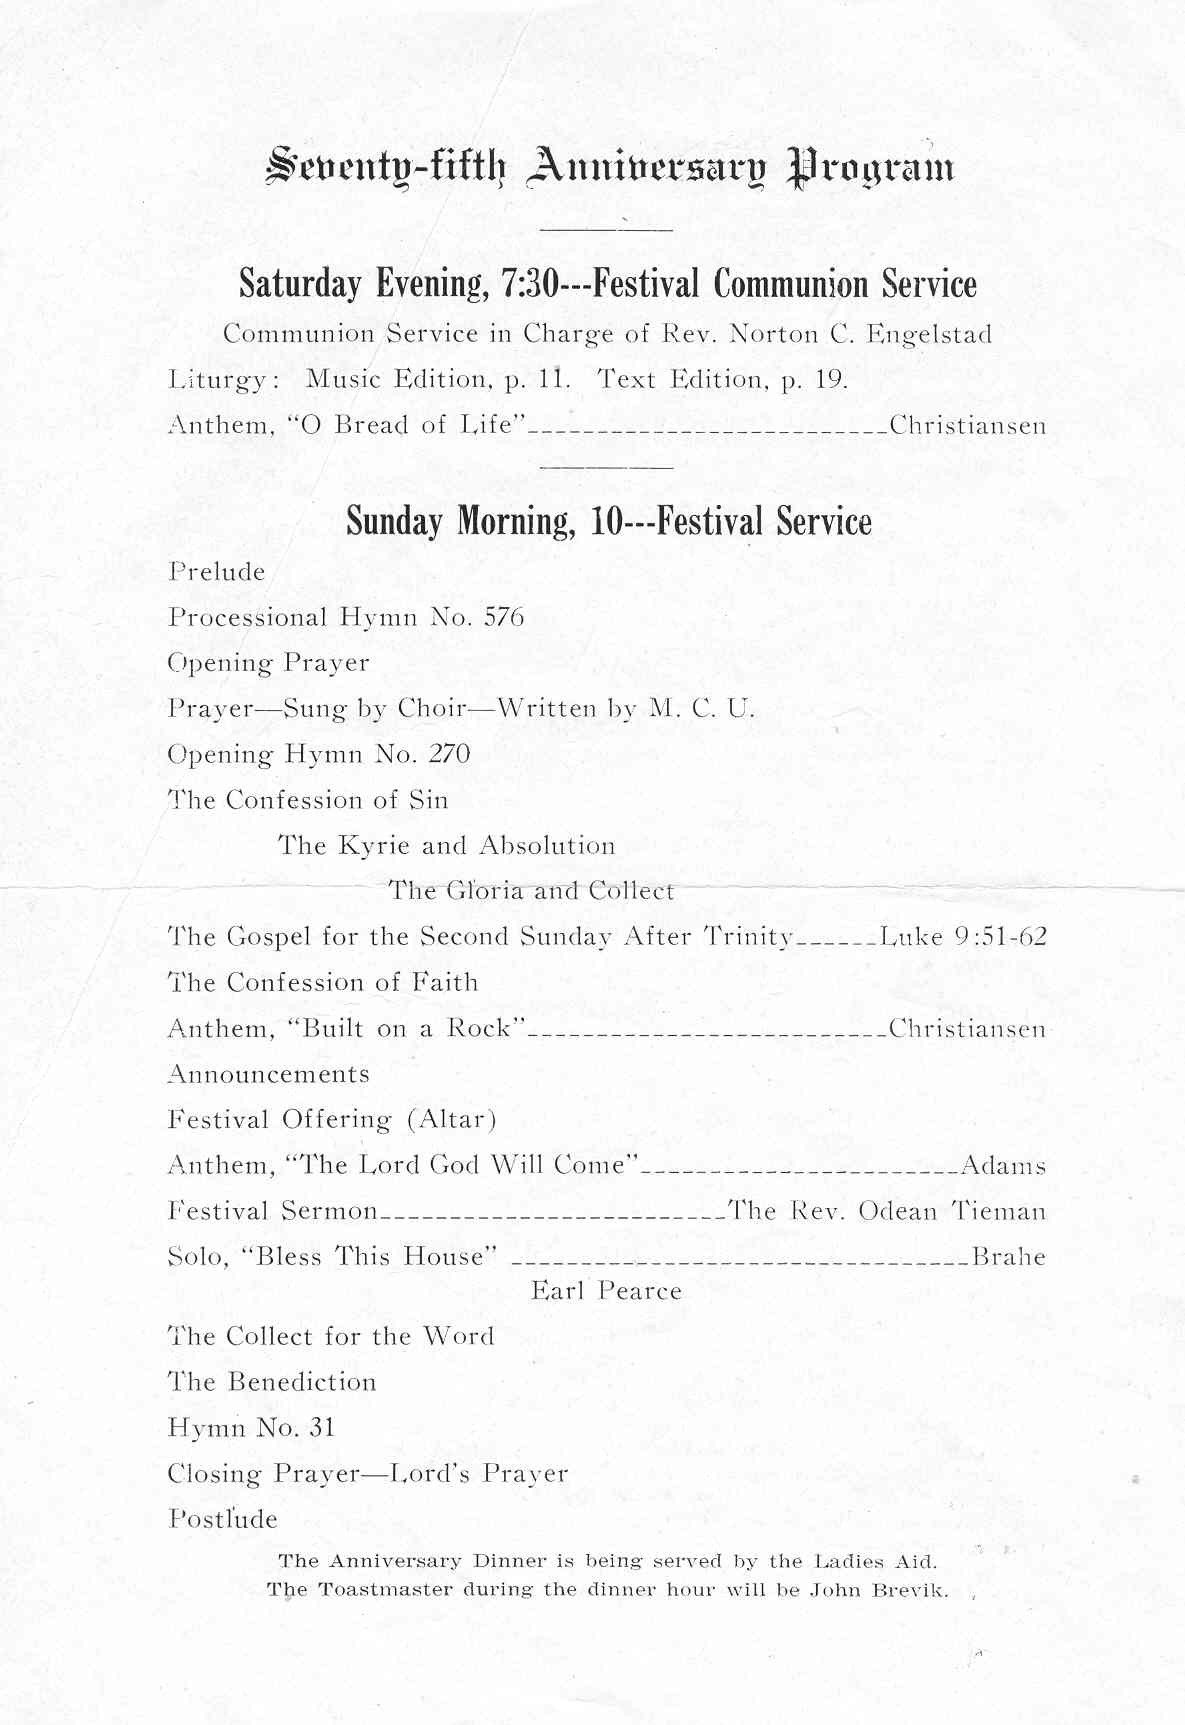 History of the Calumet Norwegian Lutheran Church